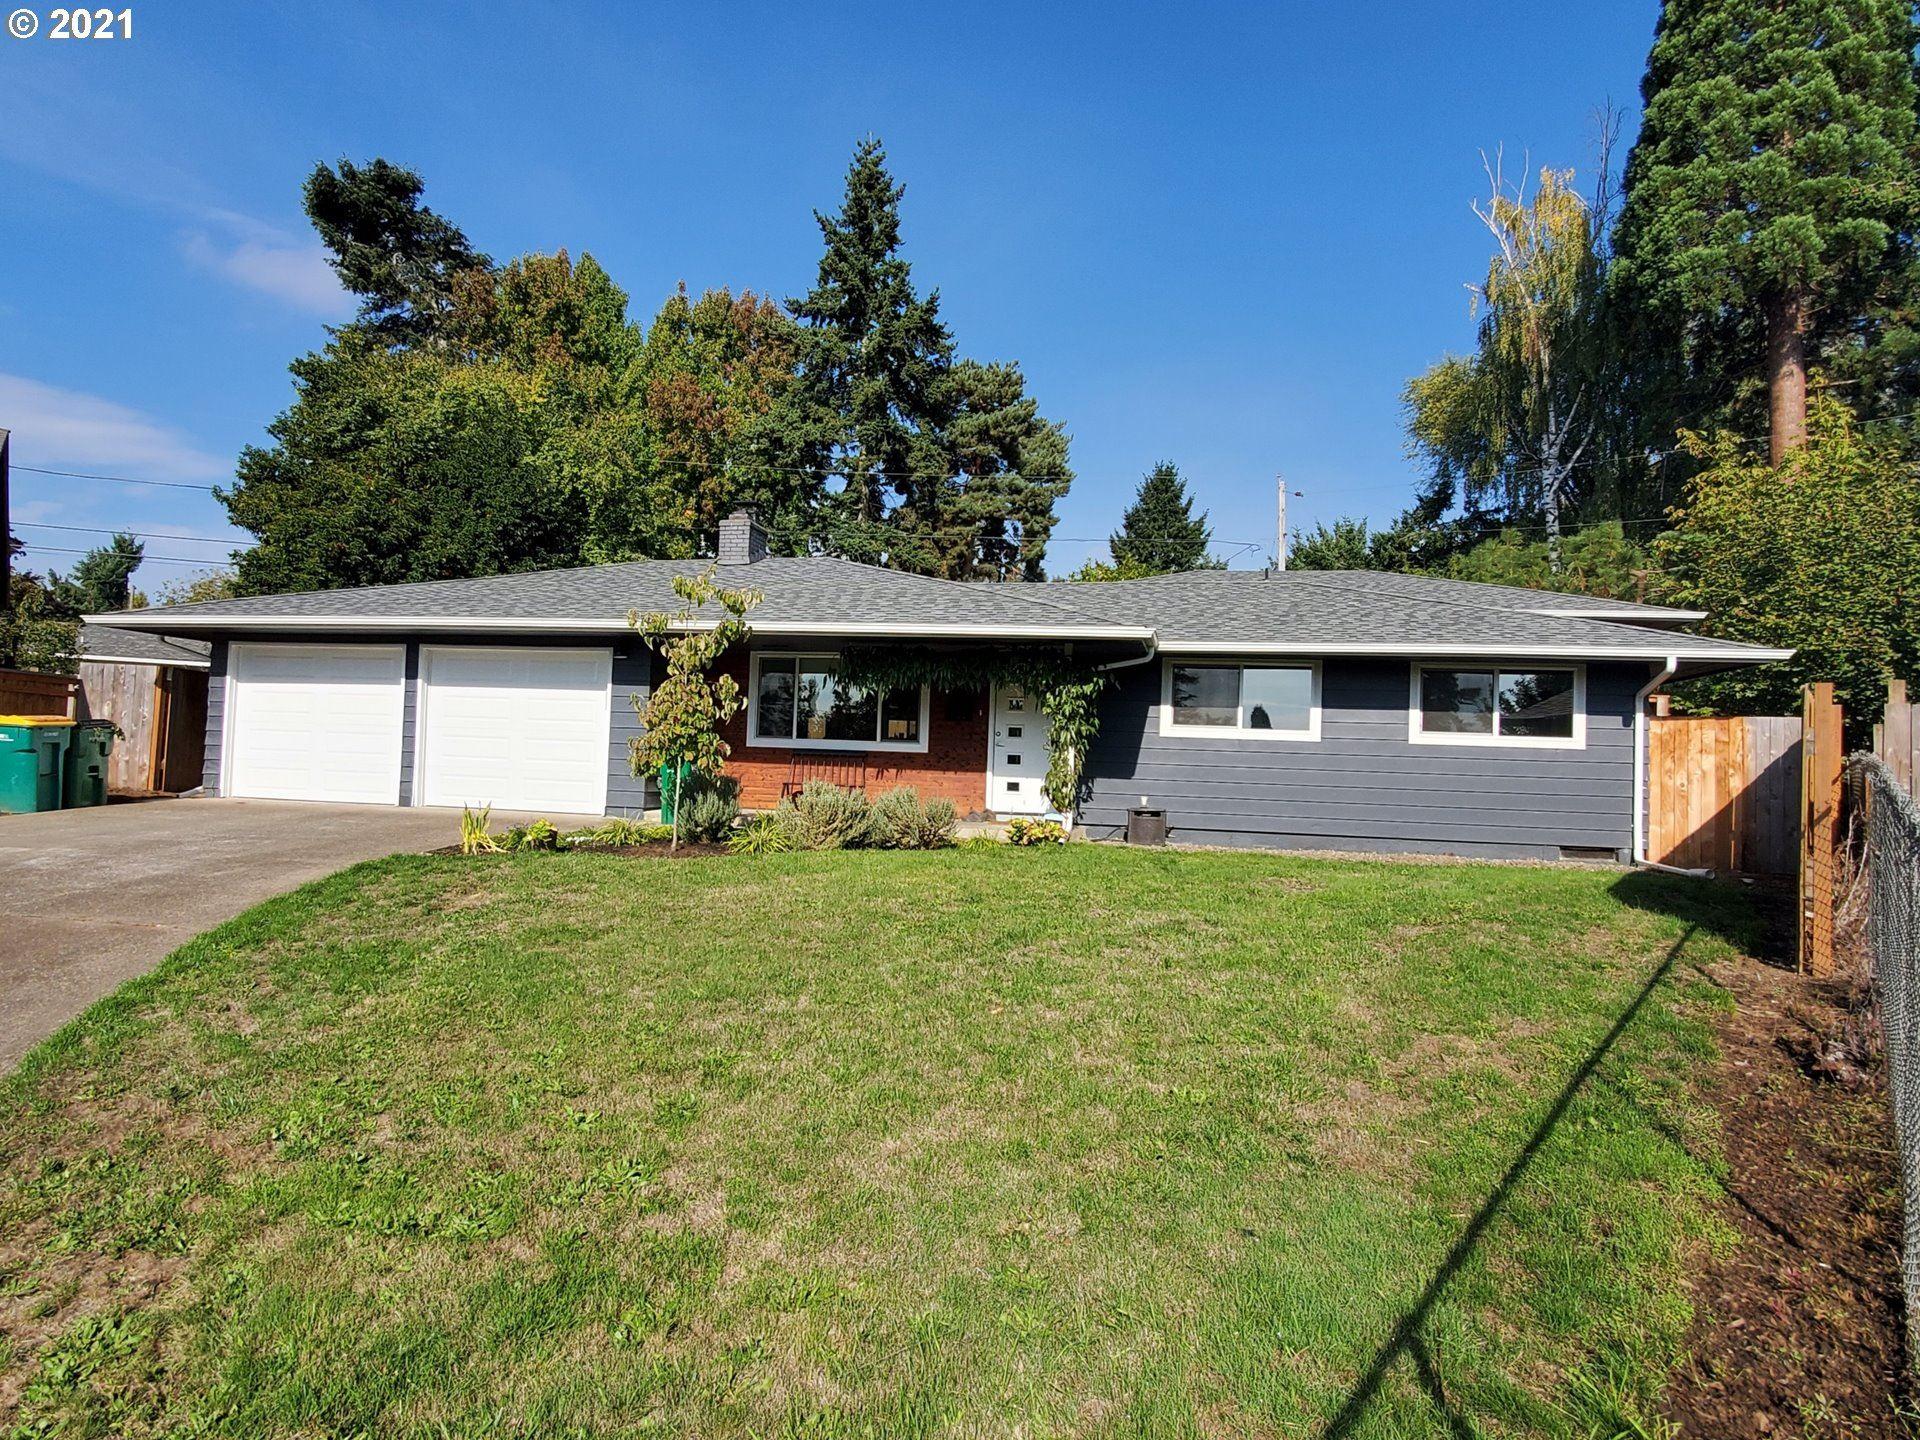 Photo of 13485 SW DRIFTWOOD PL, Beaverton, OR 97005 (MLS # 21685393)